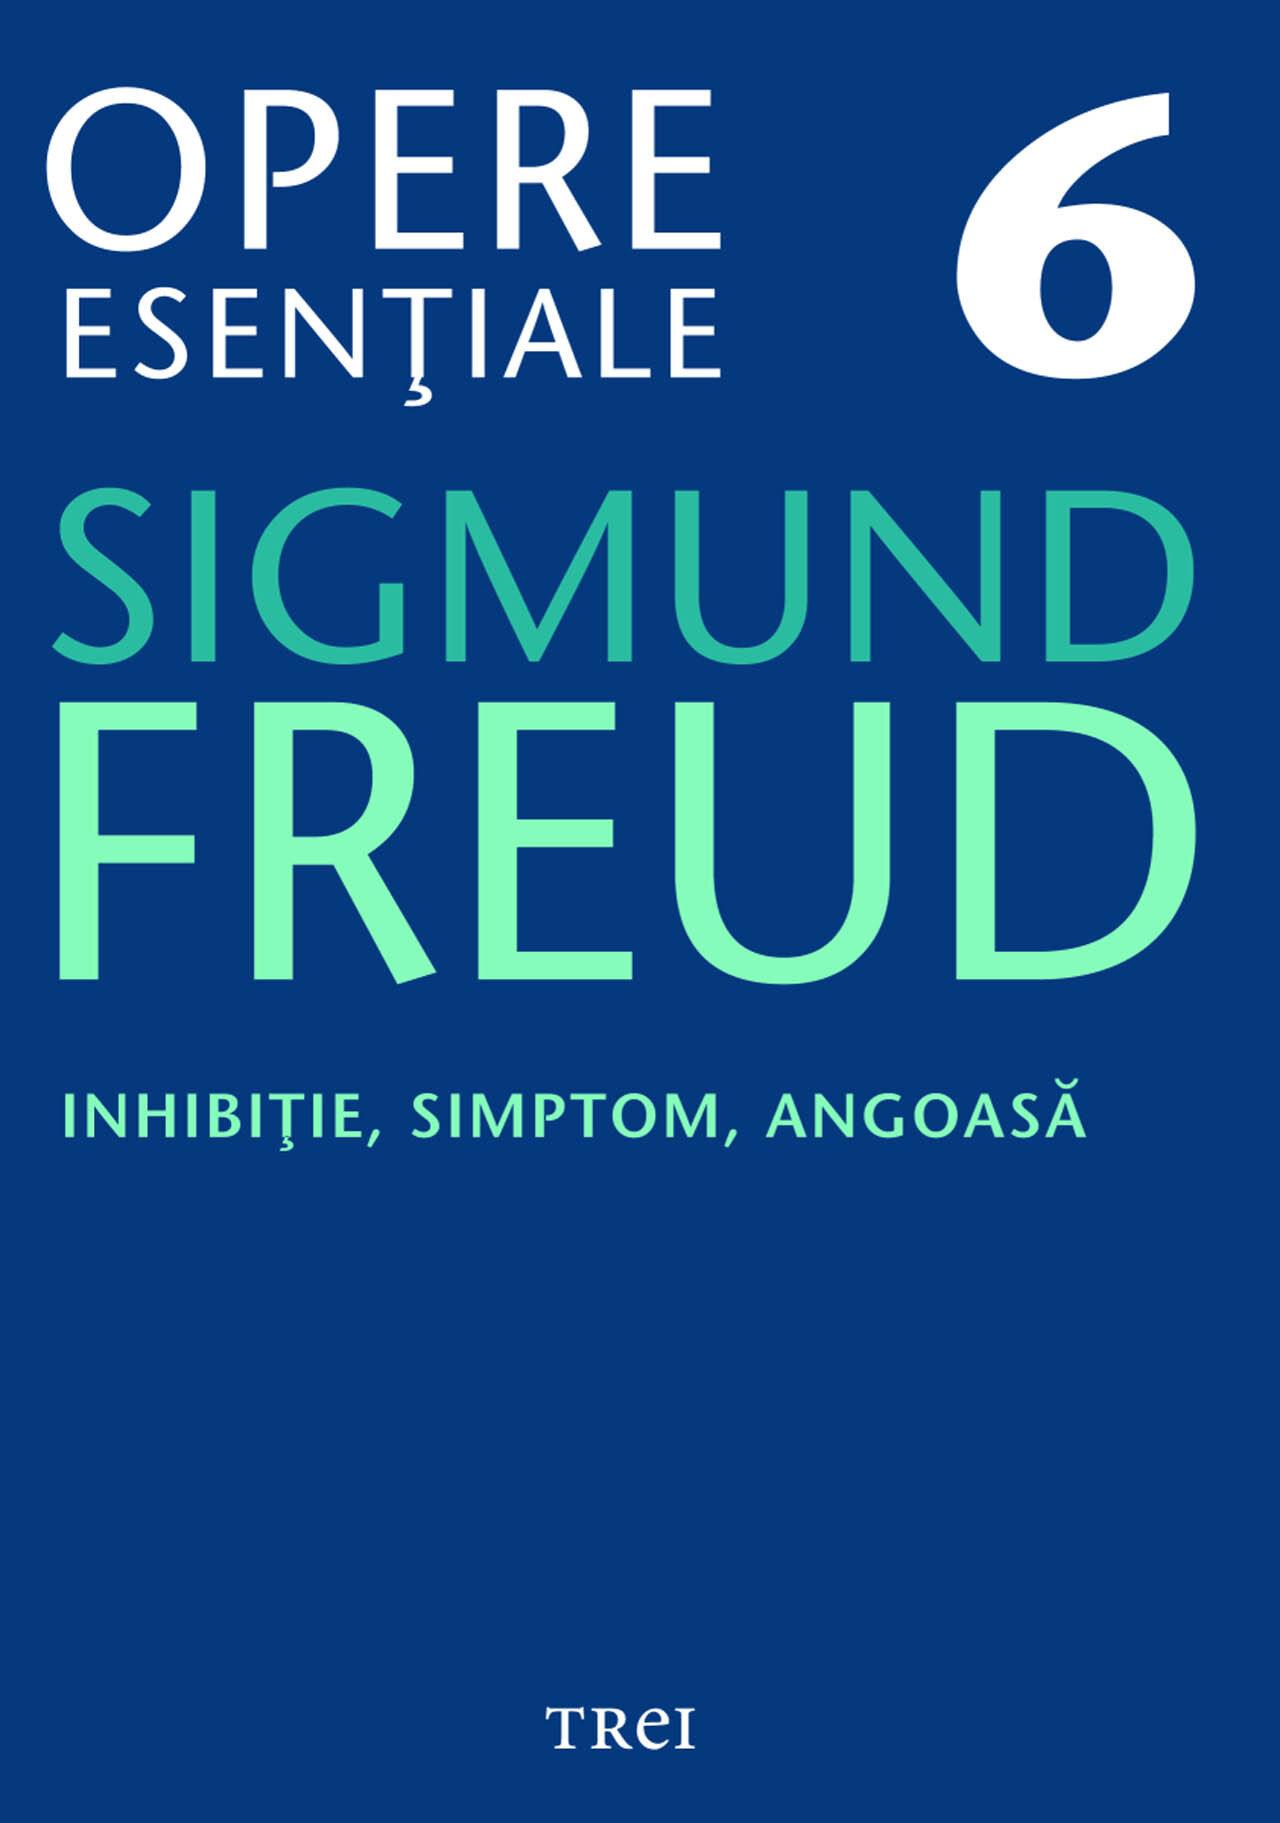 Opere Esentiale, vol. 6 - Inhibitie, simptom, angoasa (eBook)